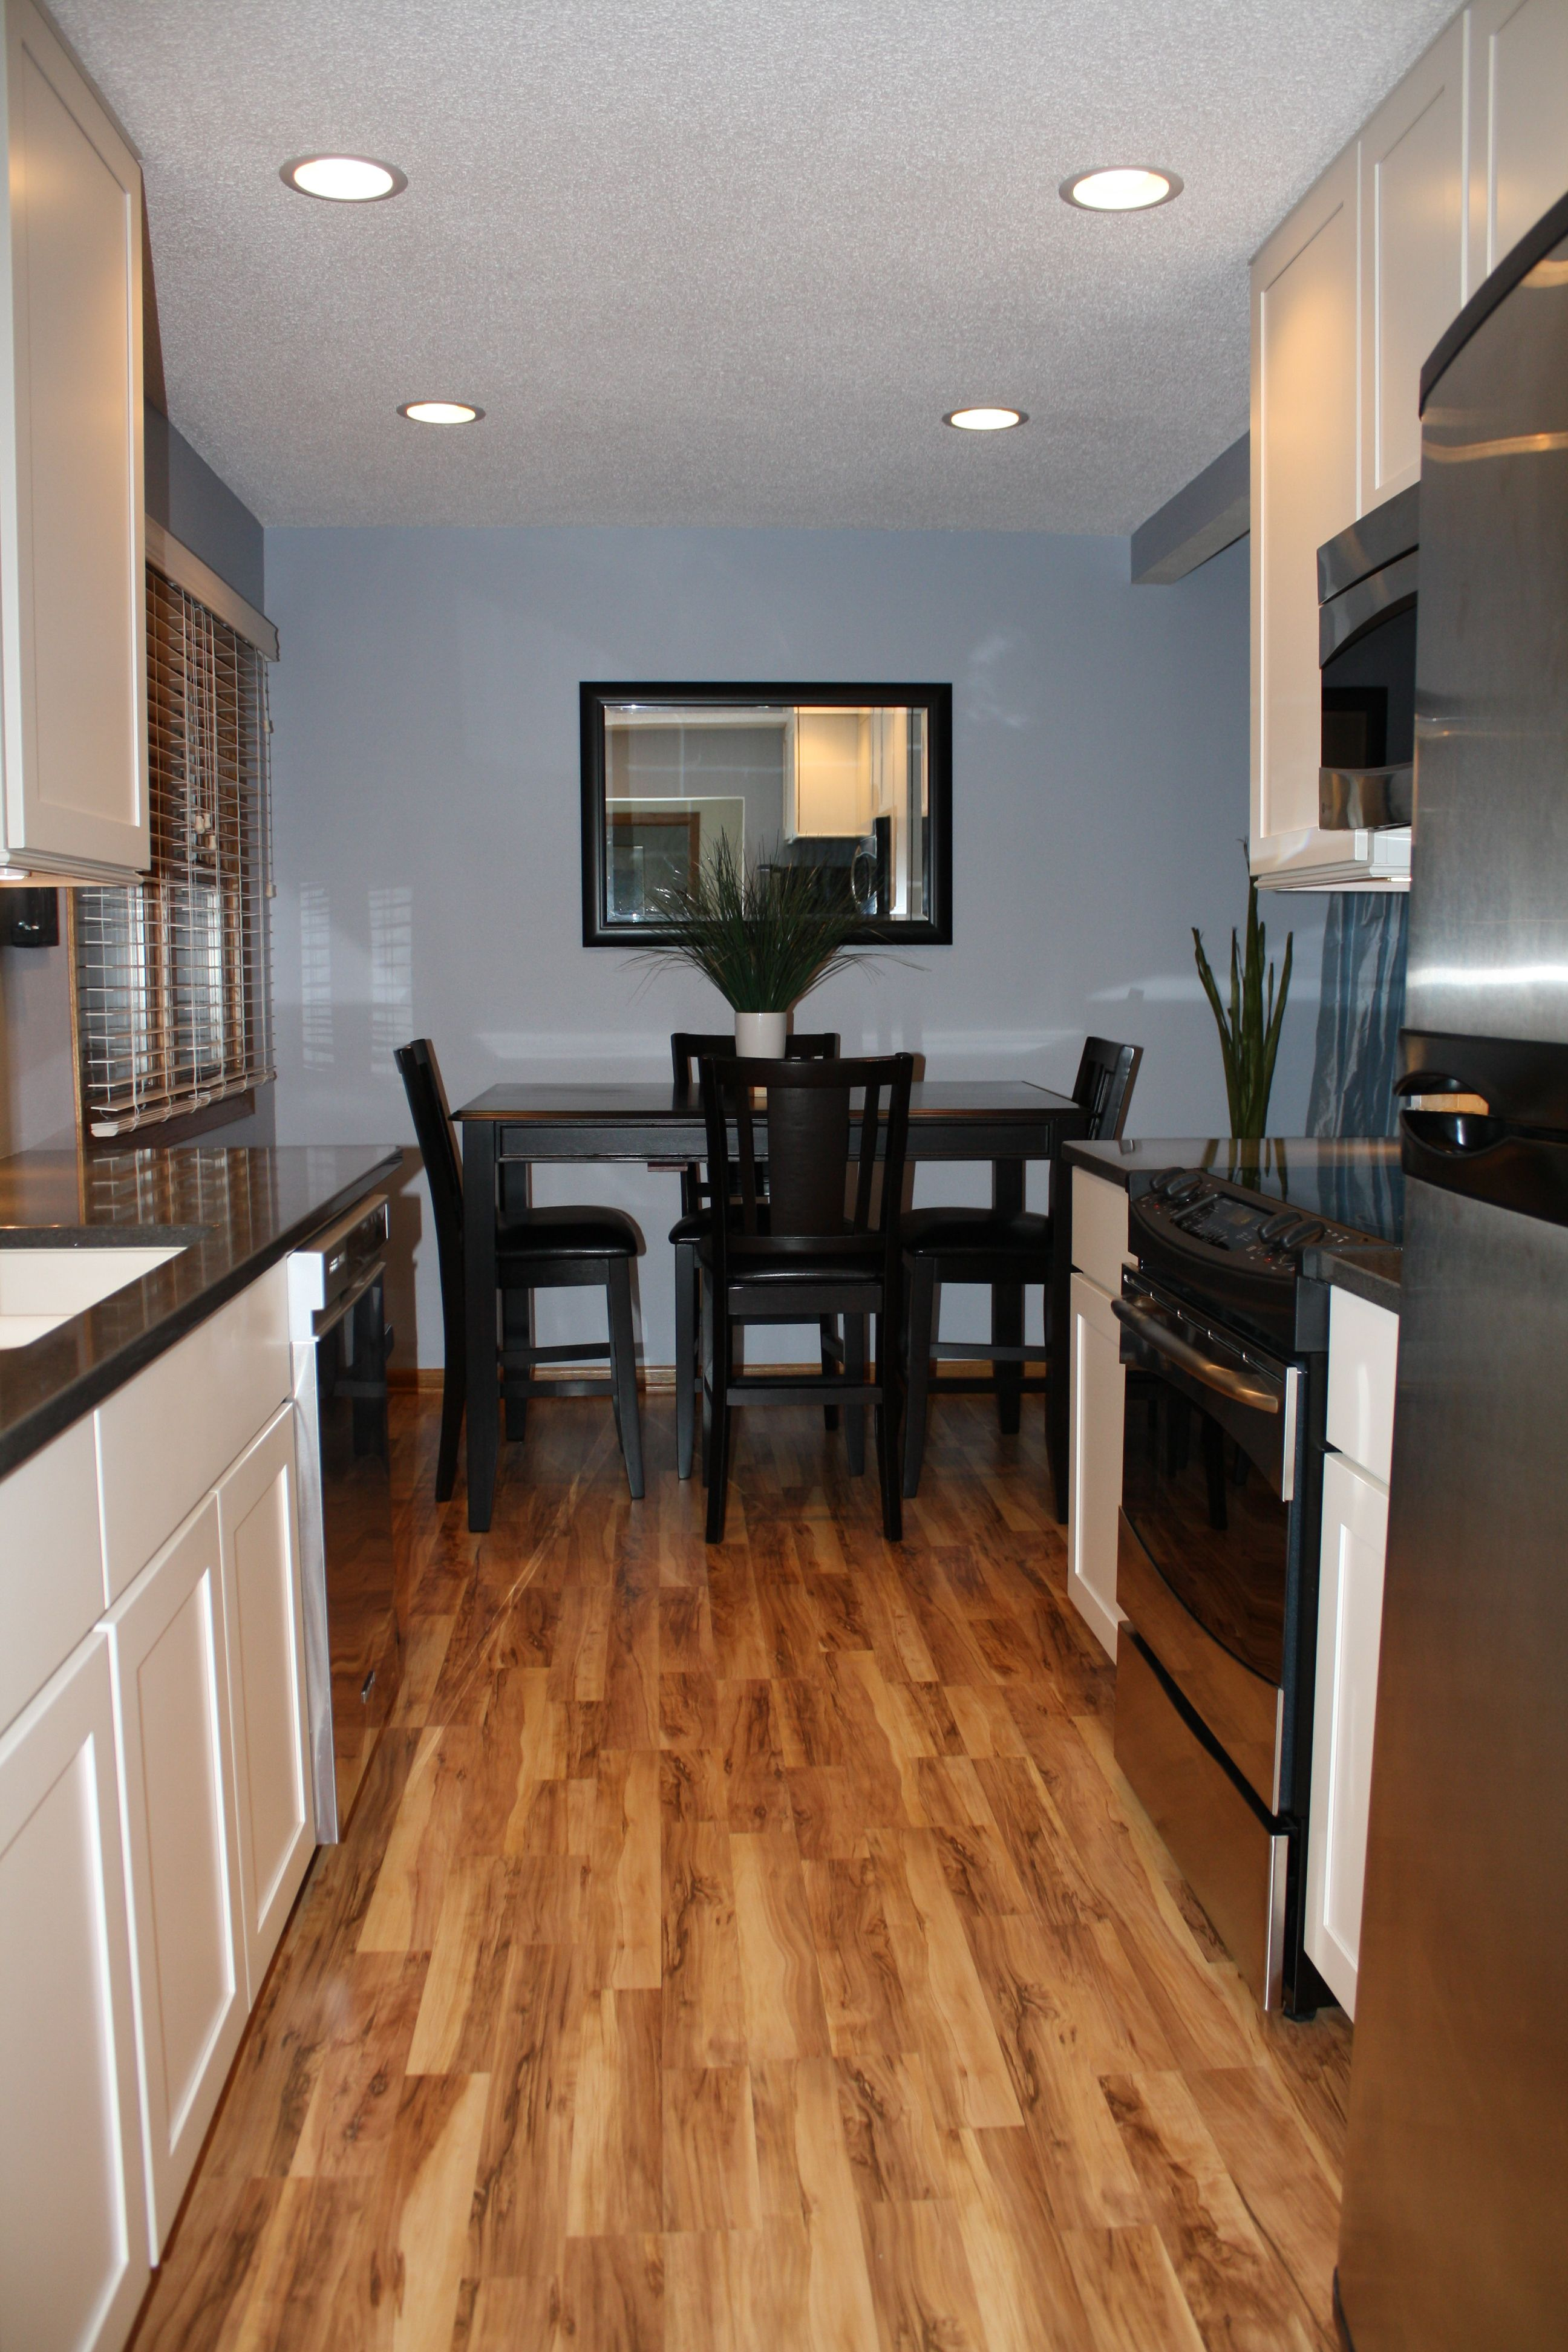 Kitchen Remodel/expansion In West Des Moines.